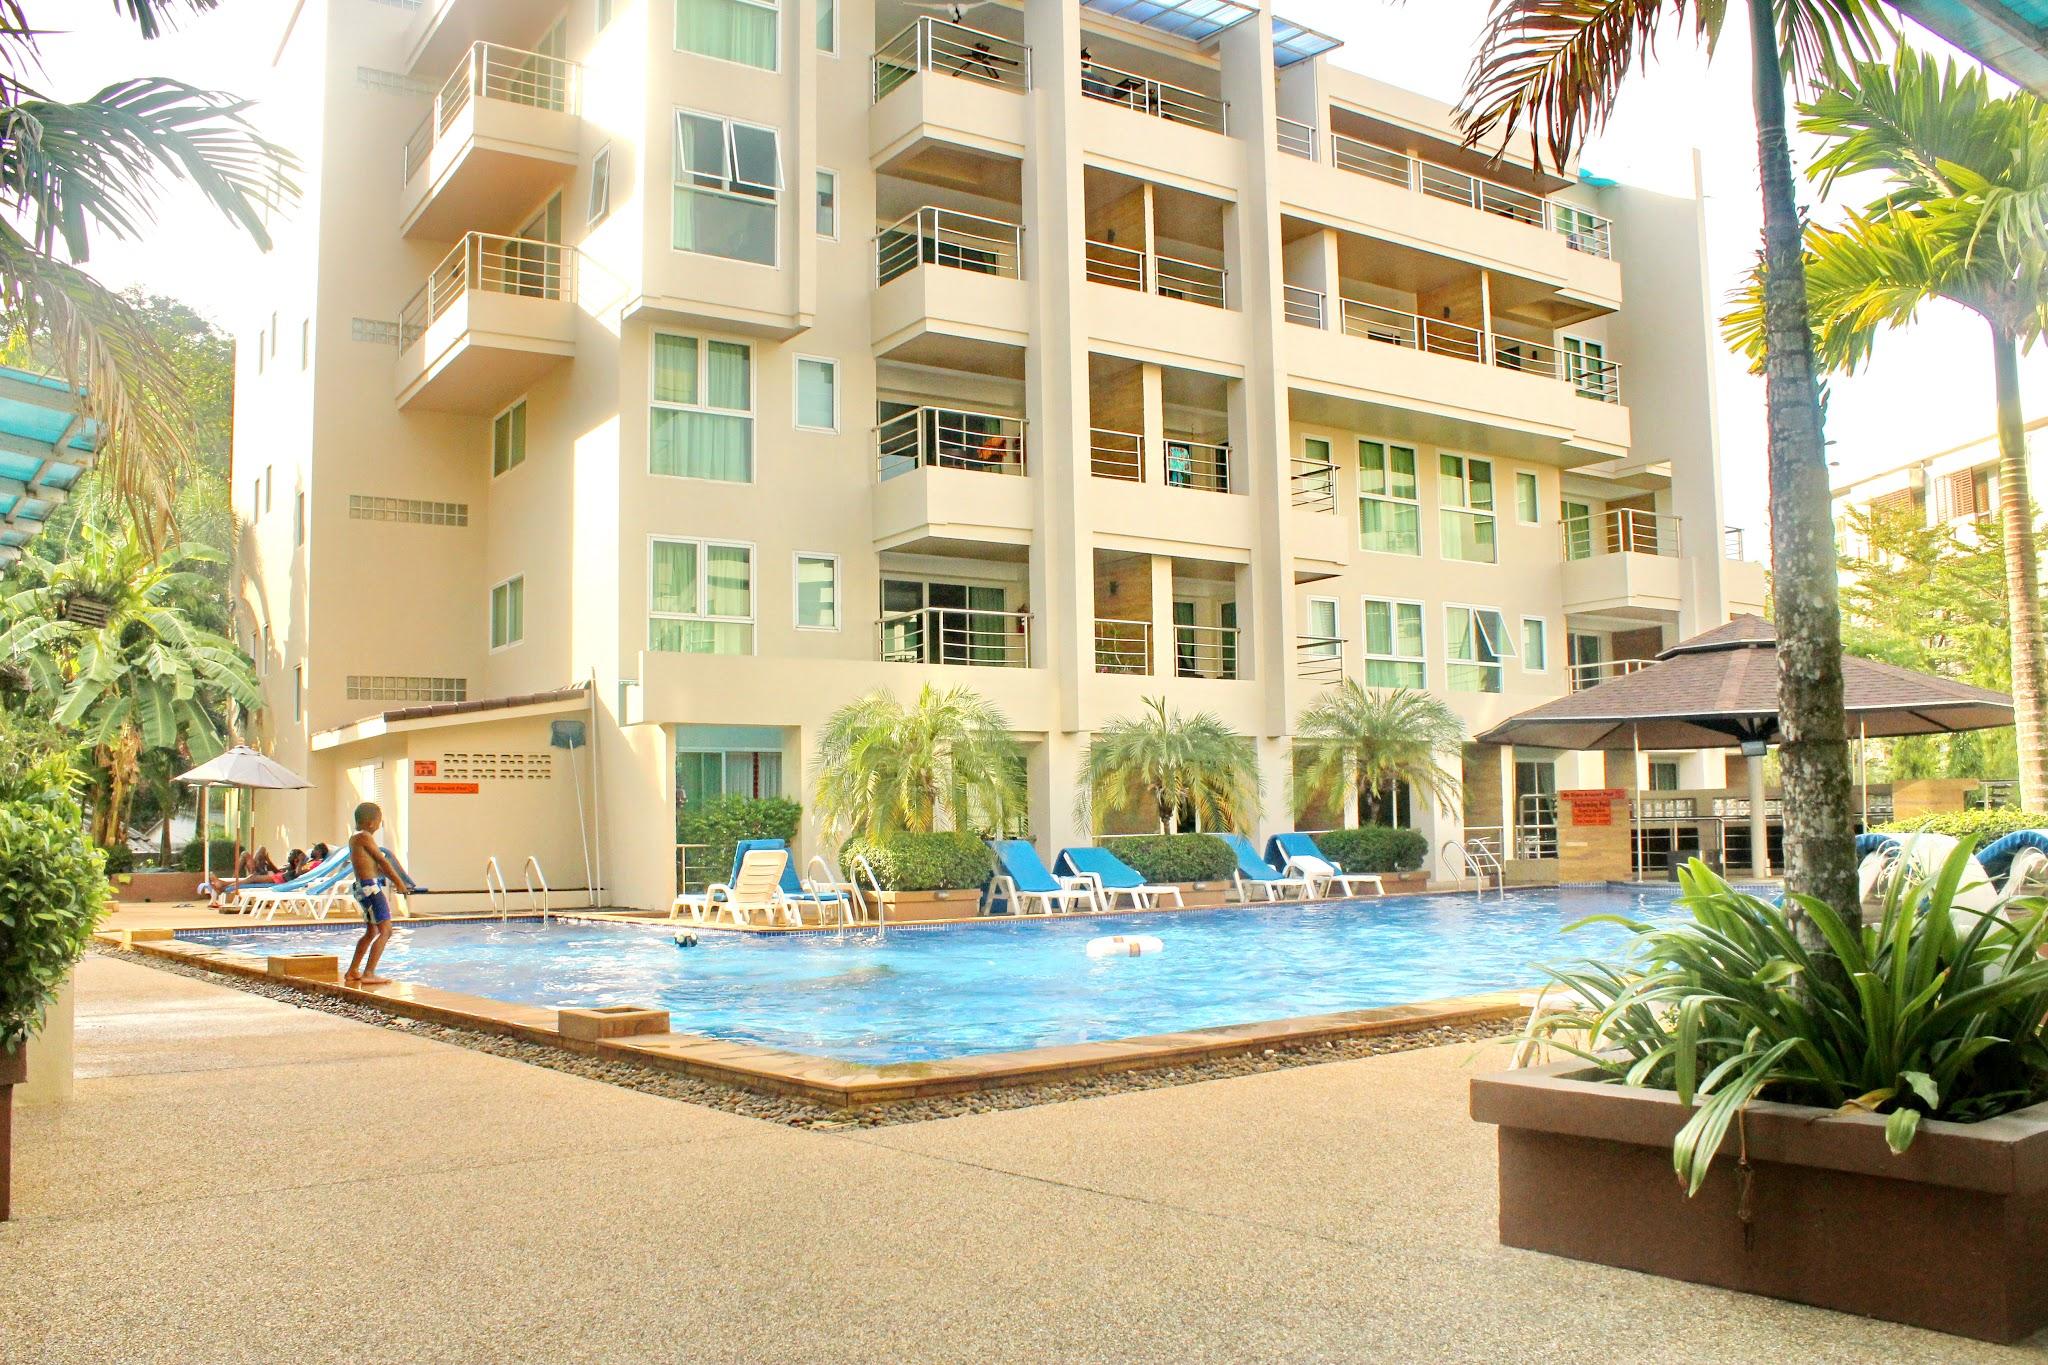 Patong Harbor View Swimming Pool and Kids Pool